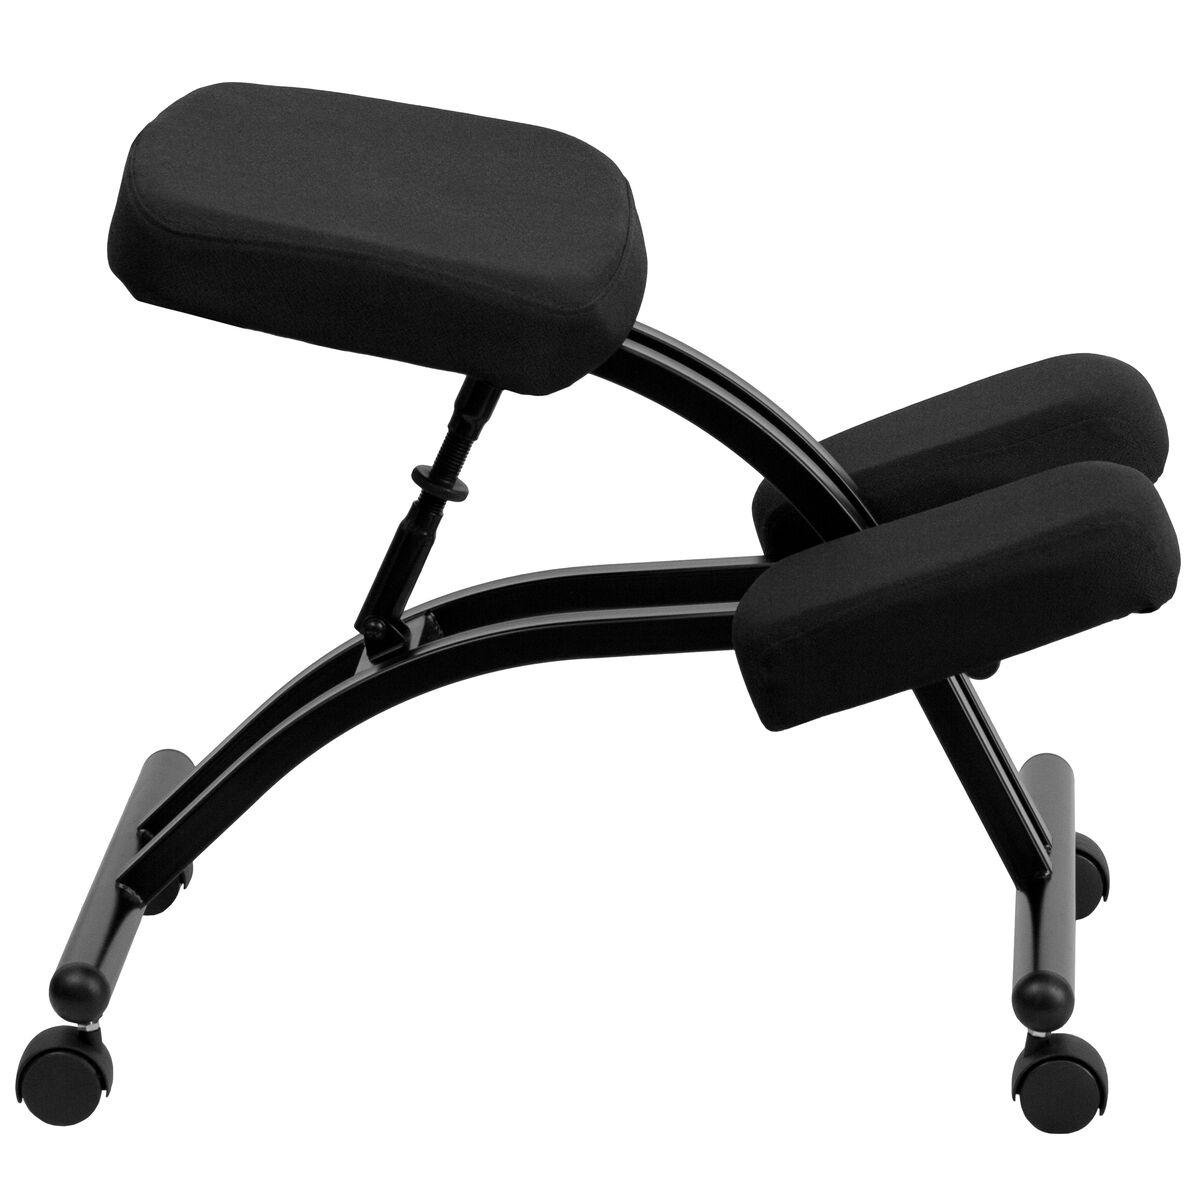 Rocking kneeling chair - Images Mobile Ergonomic Kneeling Chair